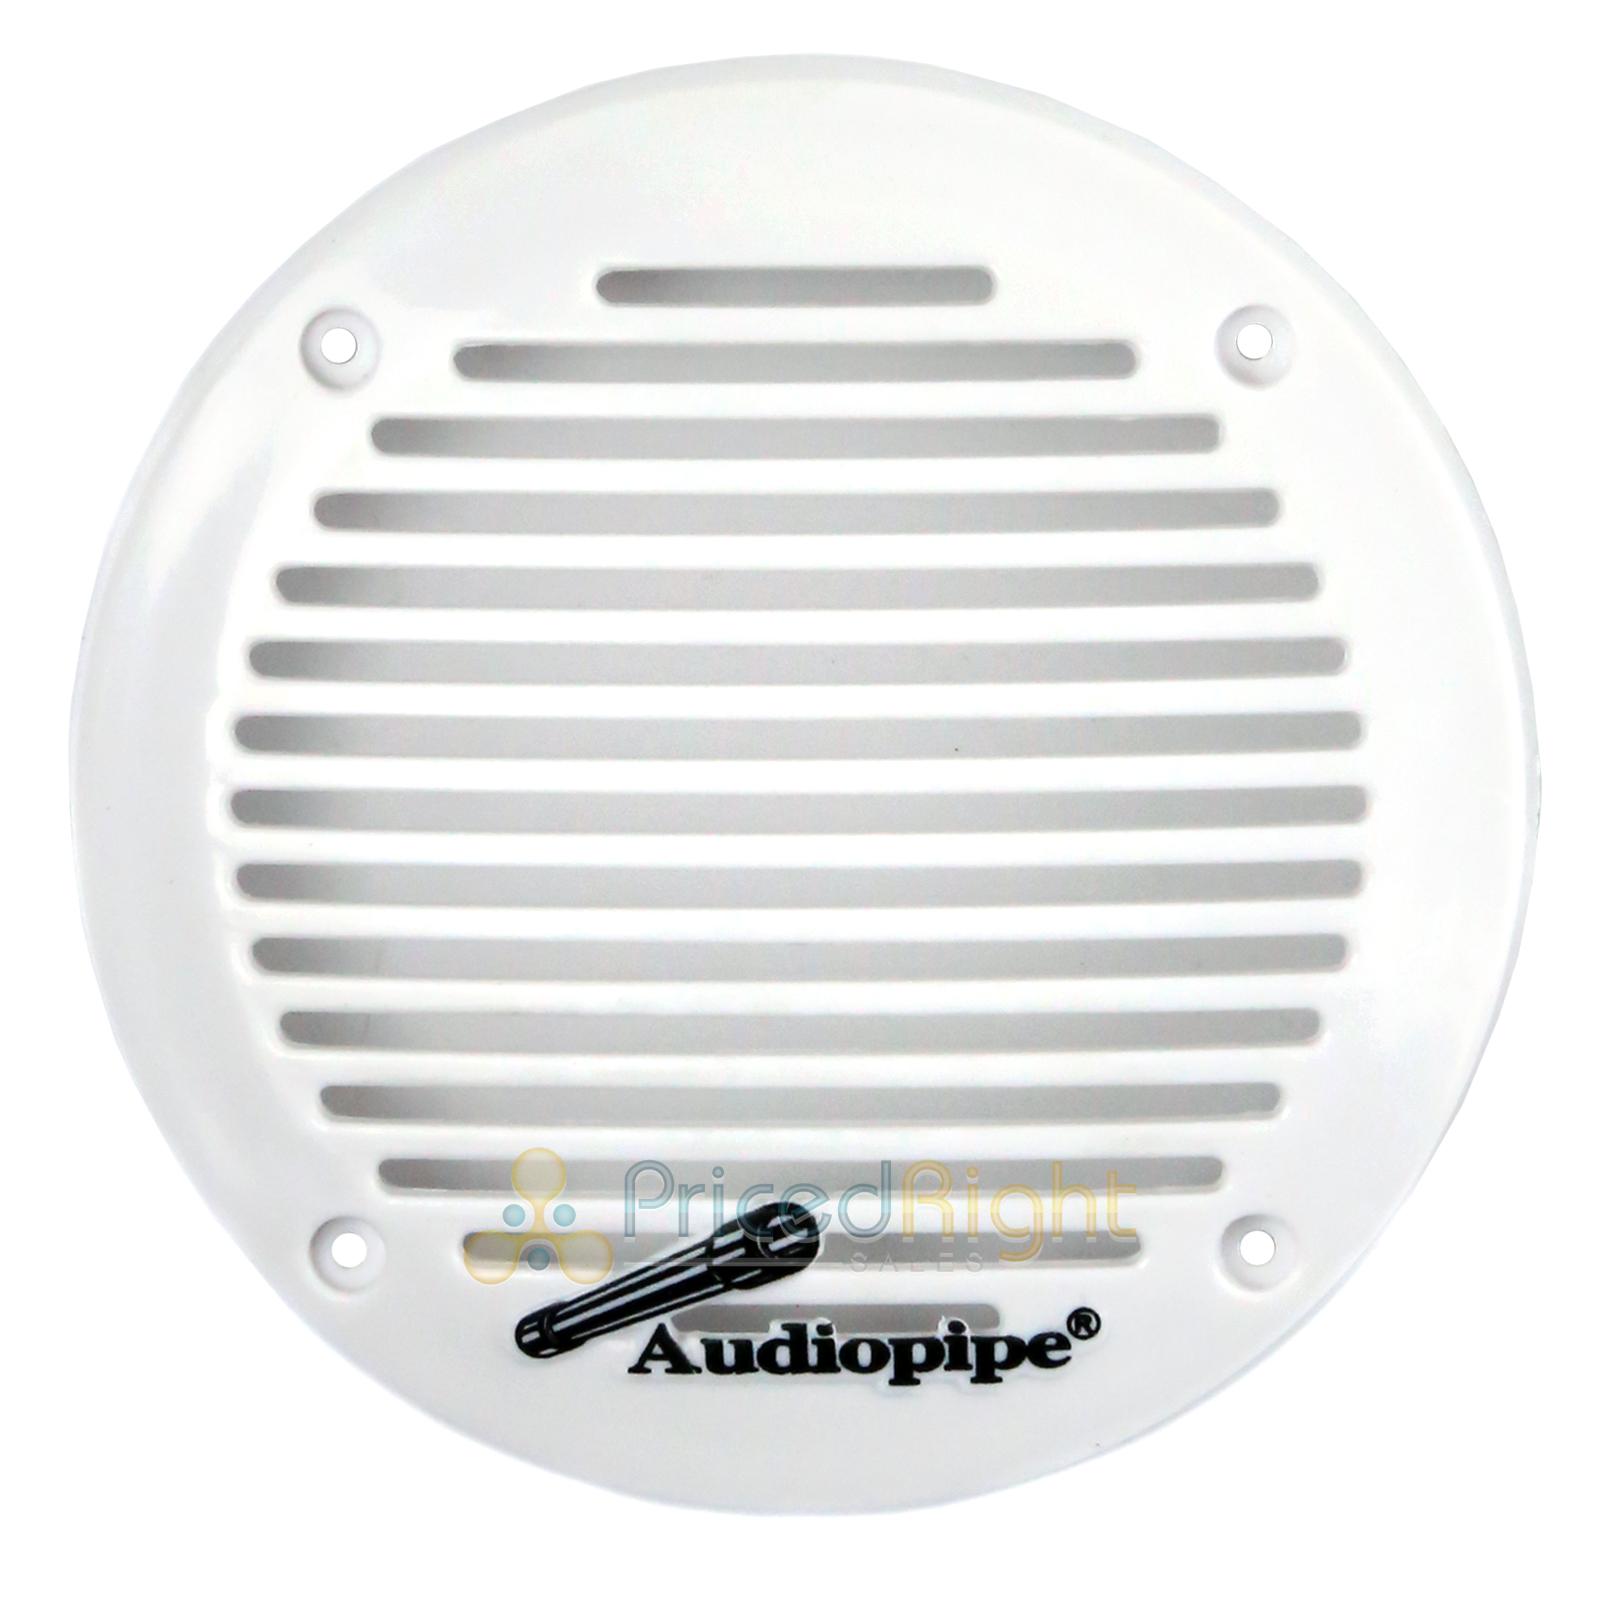 Audiopipe APSW-E1250T 1 Marine Silk Dome Tweeter 100 Watts Max Power